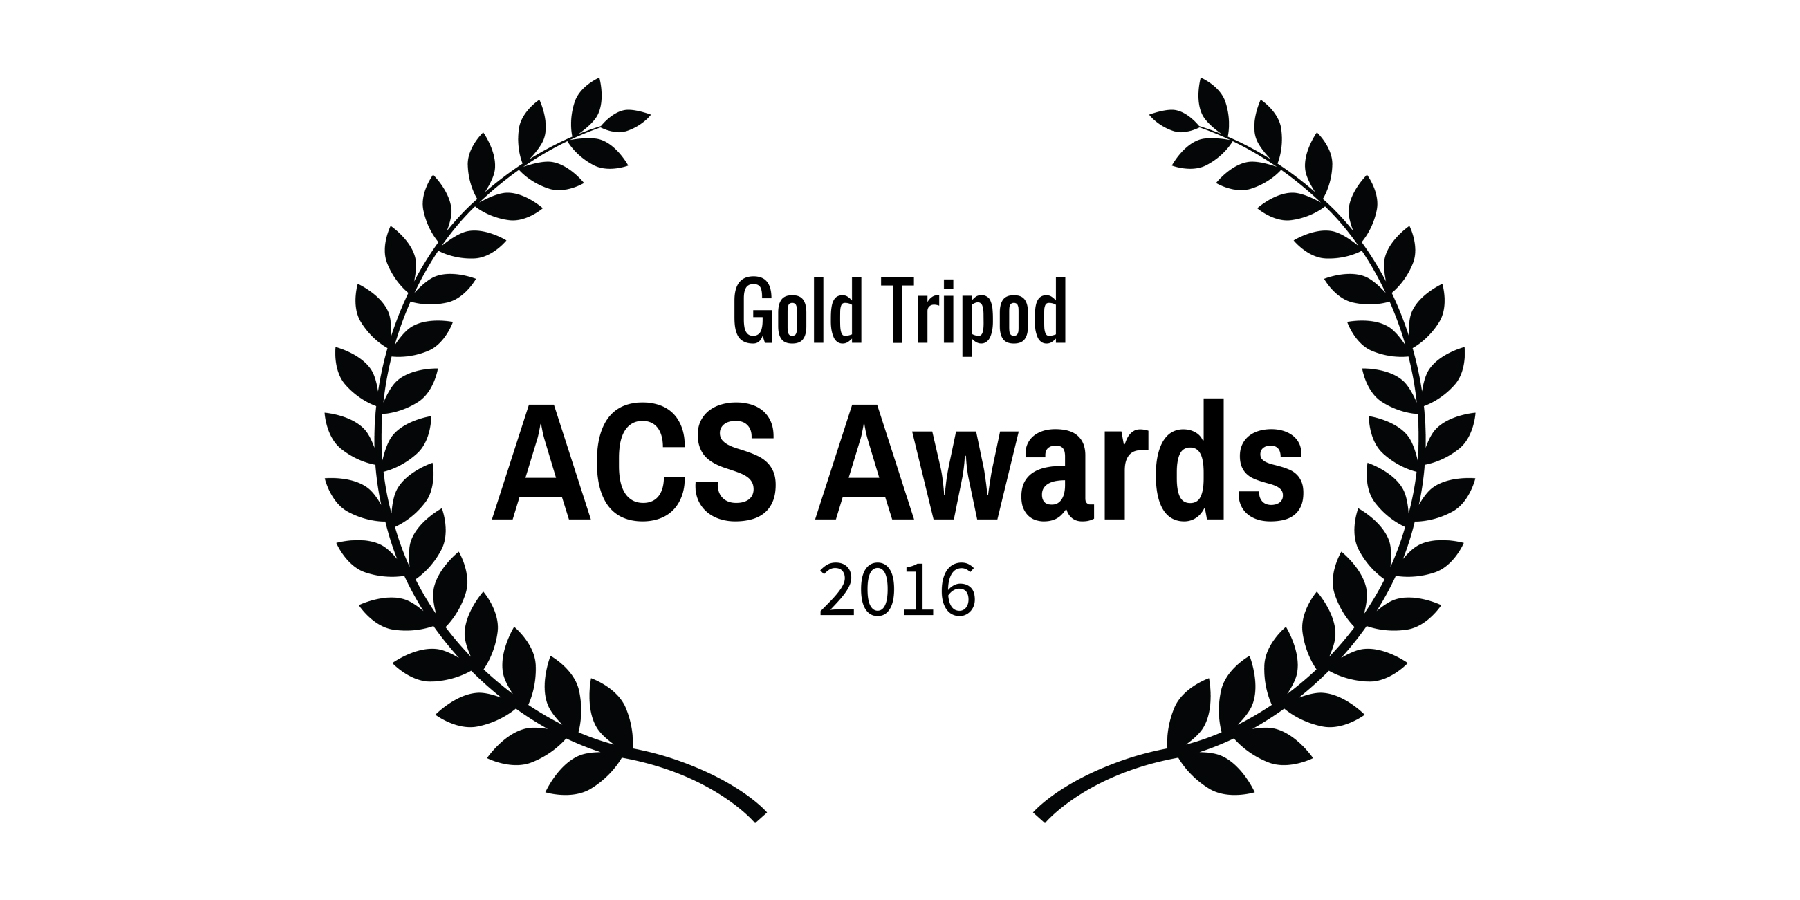 GOLD_TRIPOD_ACS AWARDS-01.jpg